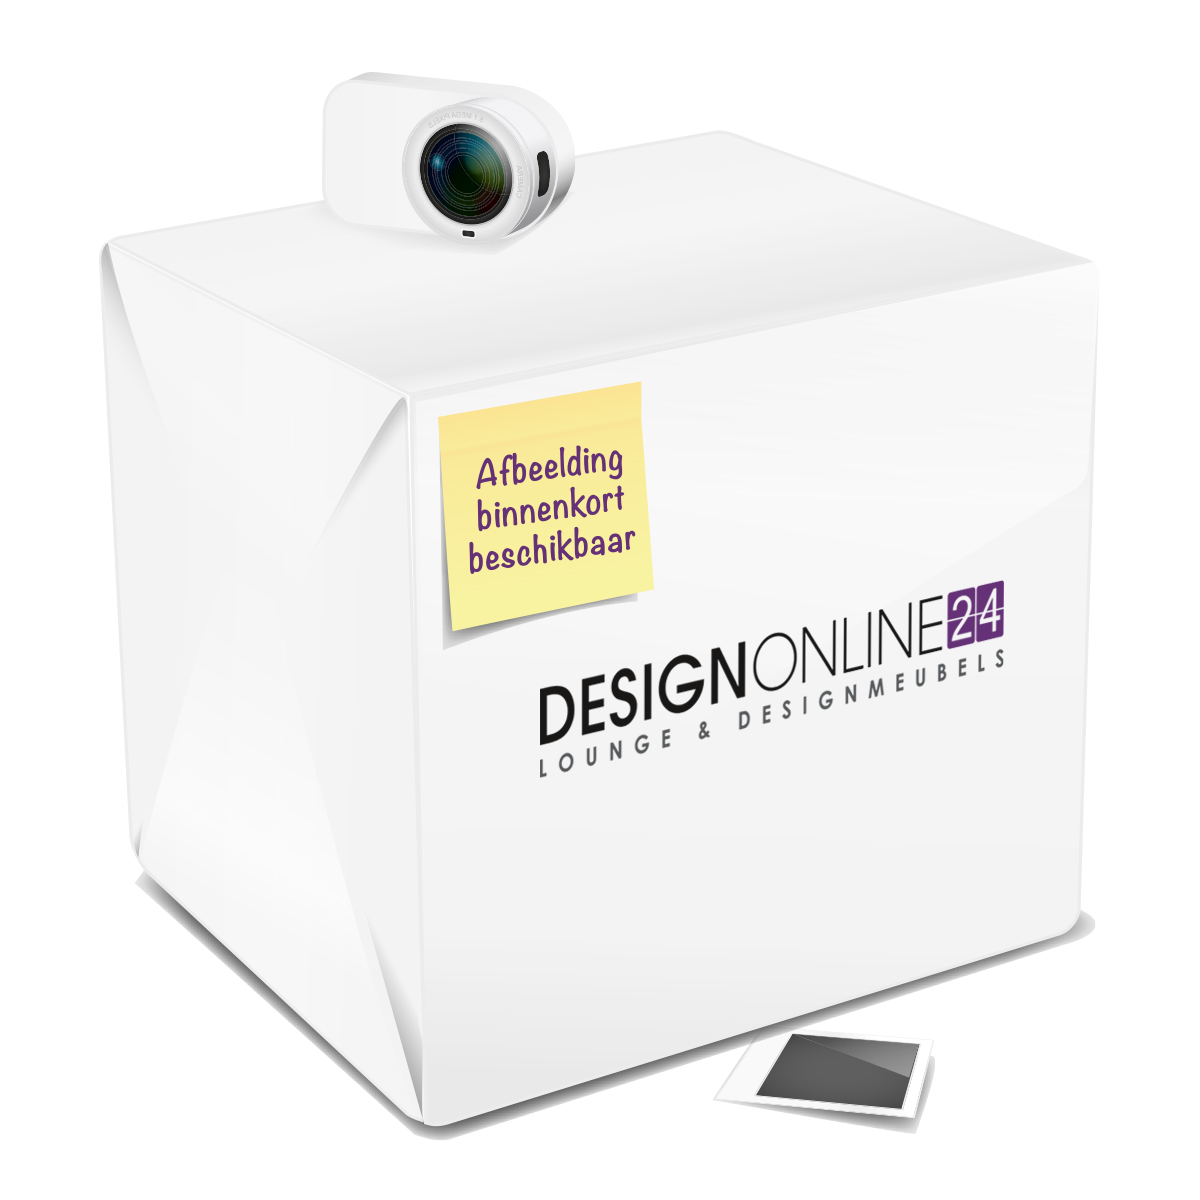 24Designs 24Designs Barkruk Maxime - Zithoogte 77 cm - Chromen onderstel - Kunstleren zitting - Wit